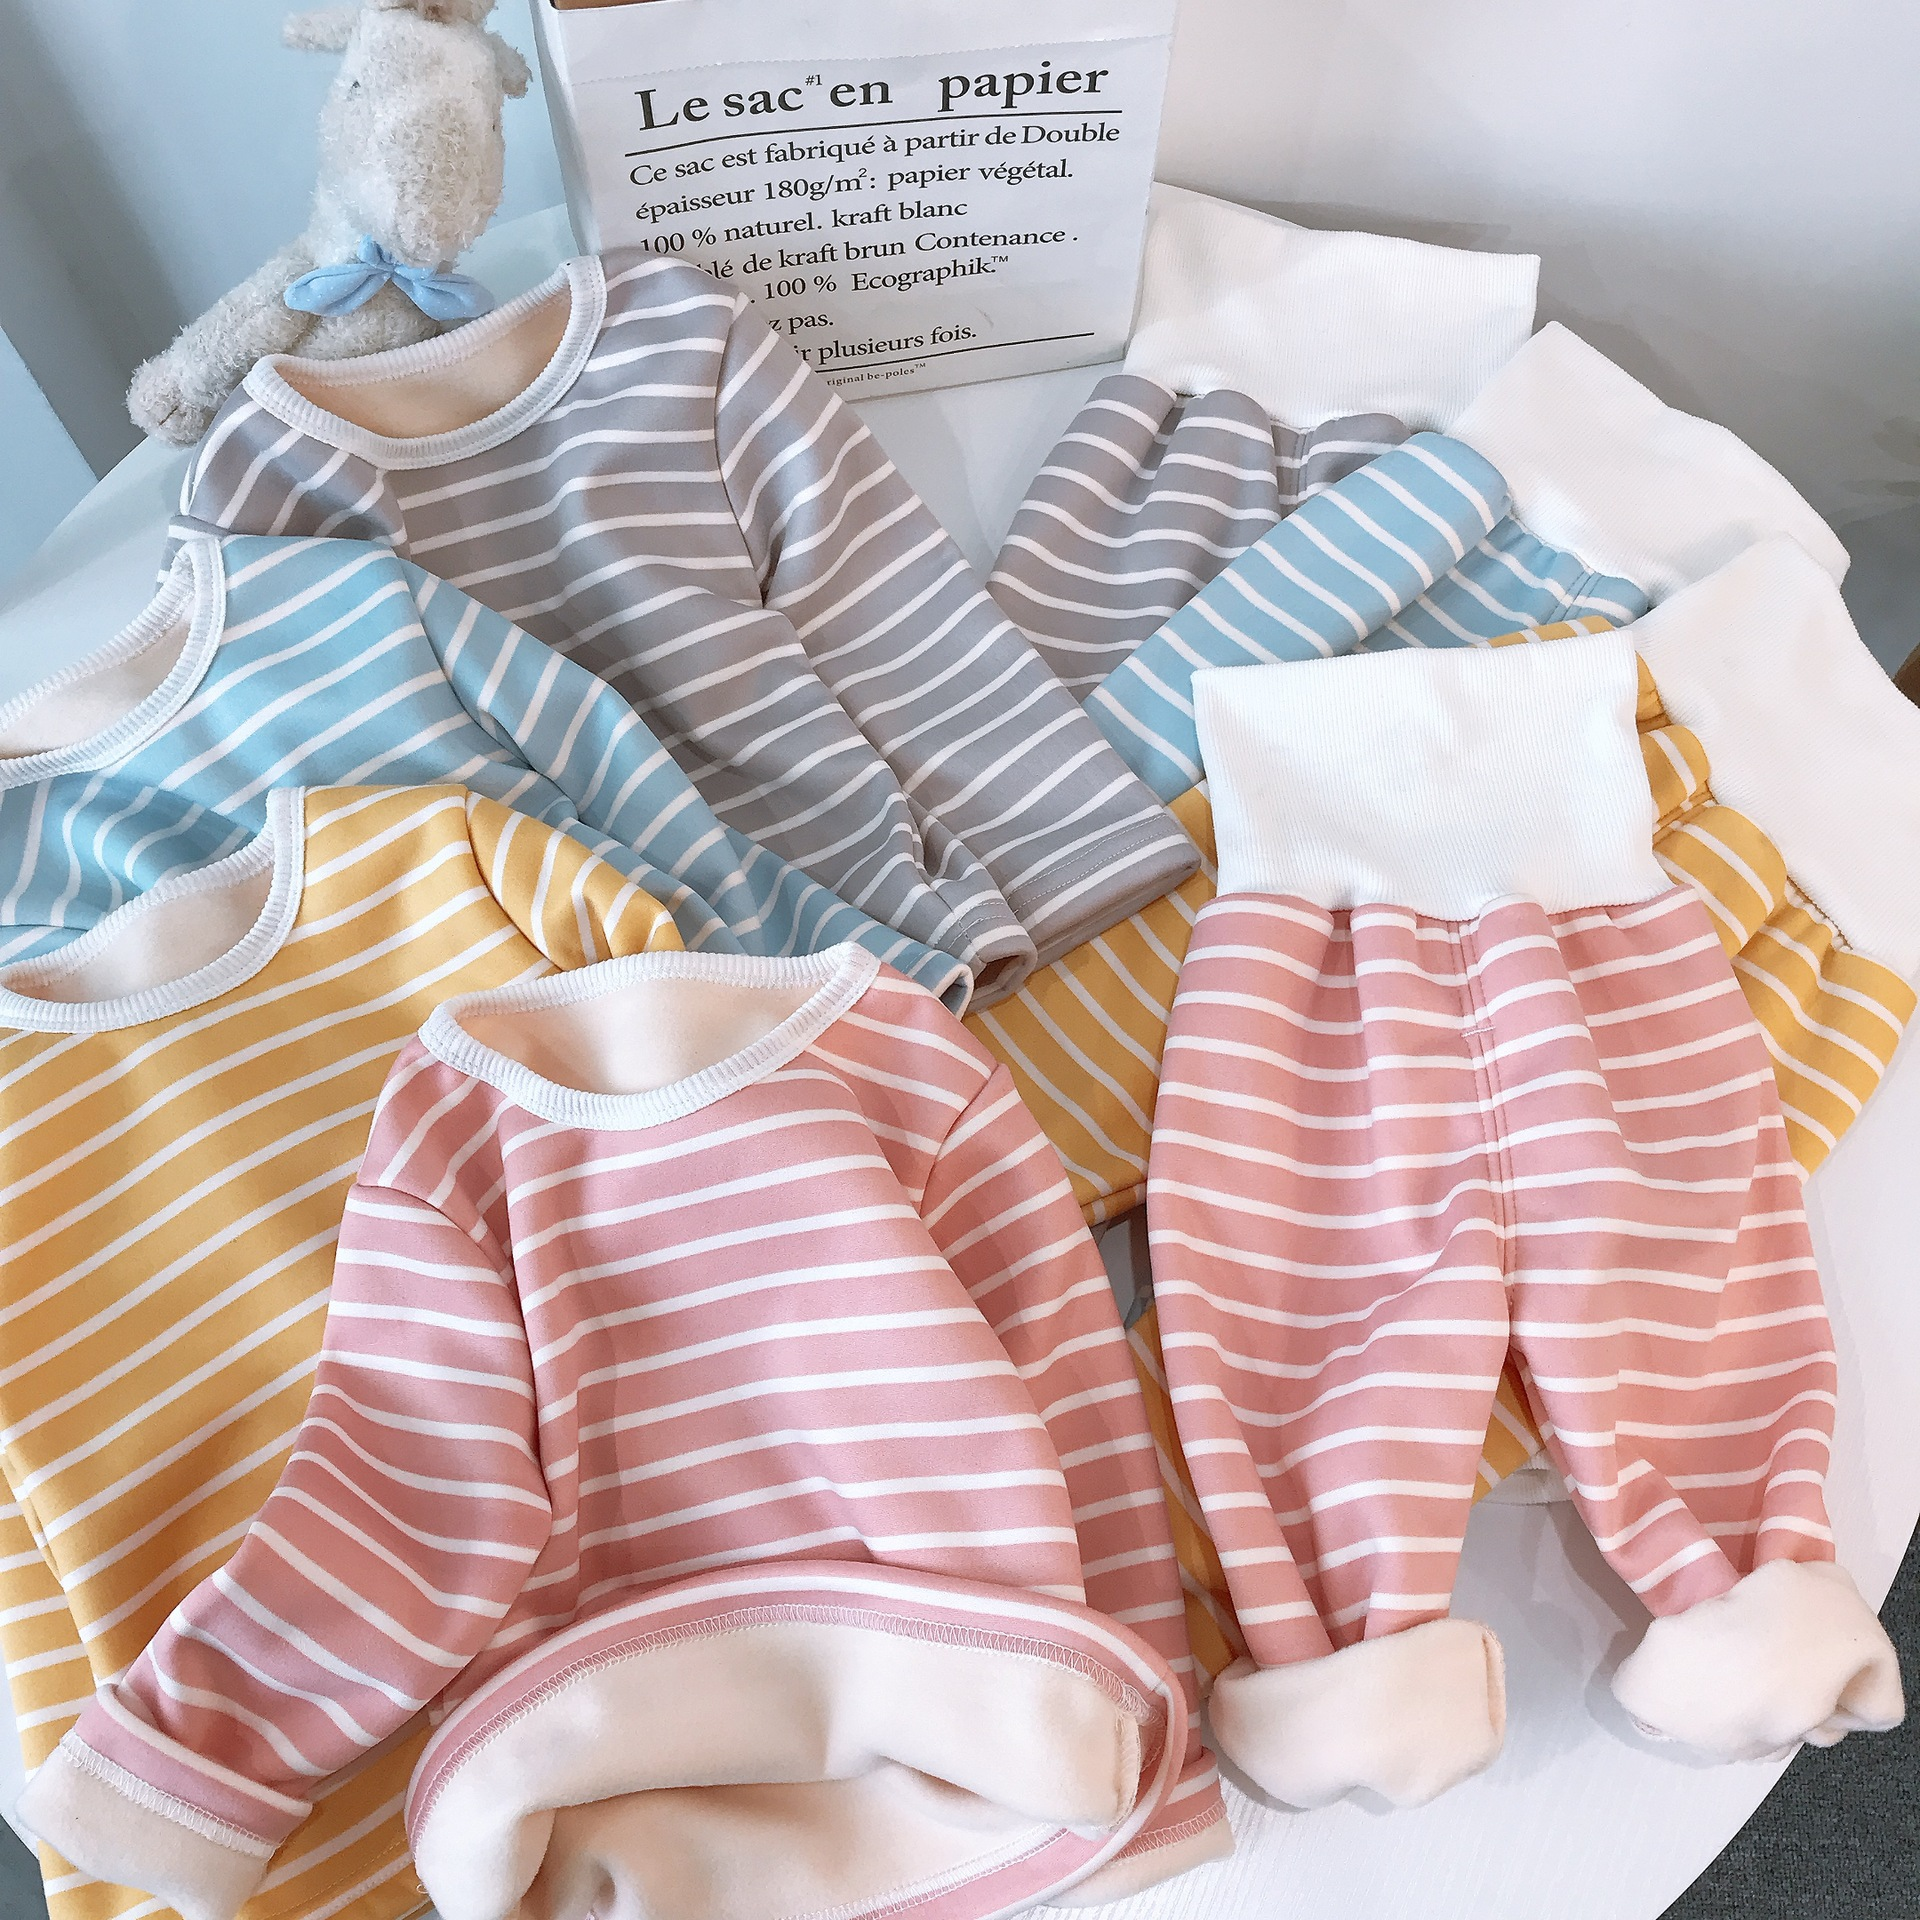 Children Pajamas Sets Baby Boys Girls Clothing Sweatshirt Waist Pants Set Toddler Warm Autumn Winter Outfits Kids Suit Clothes 6